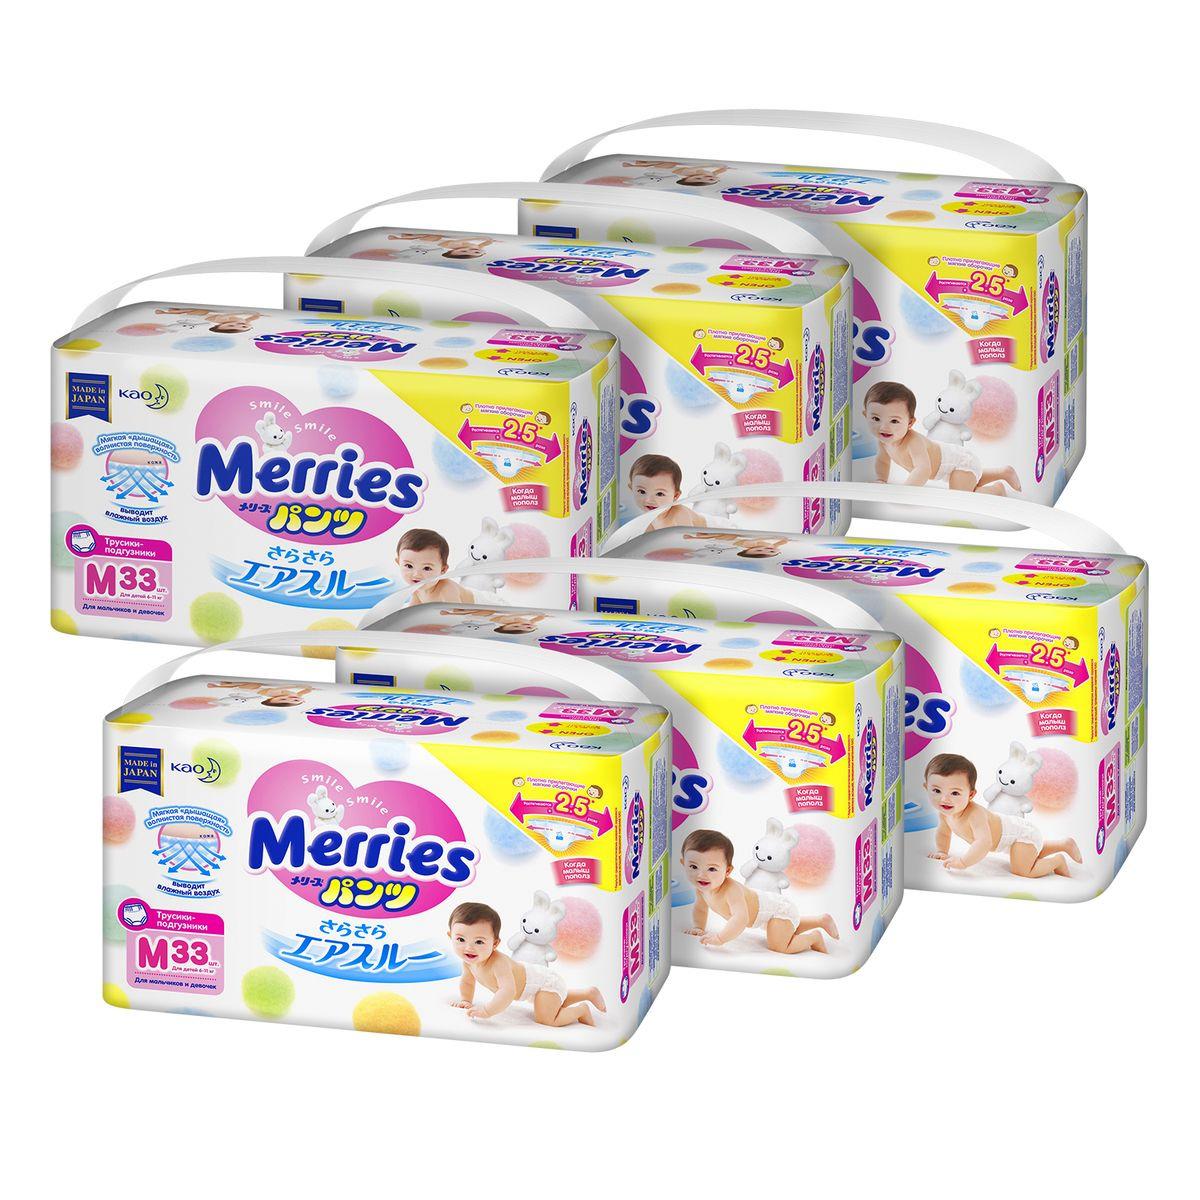 Подгузники-трусики Merries, размер M, 6-11 кг, 198 шт